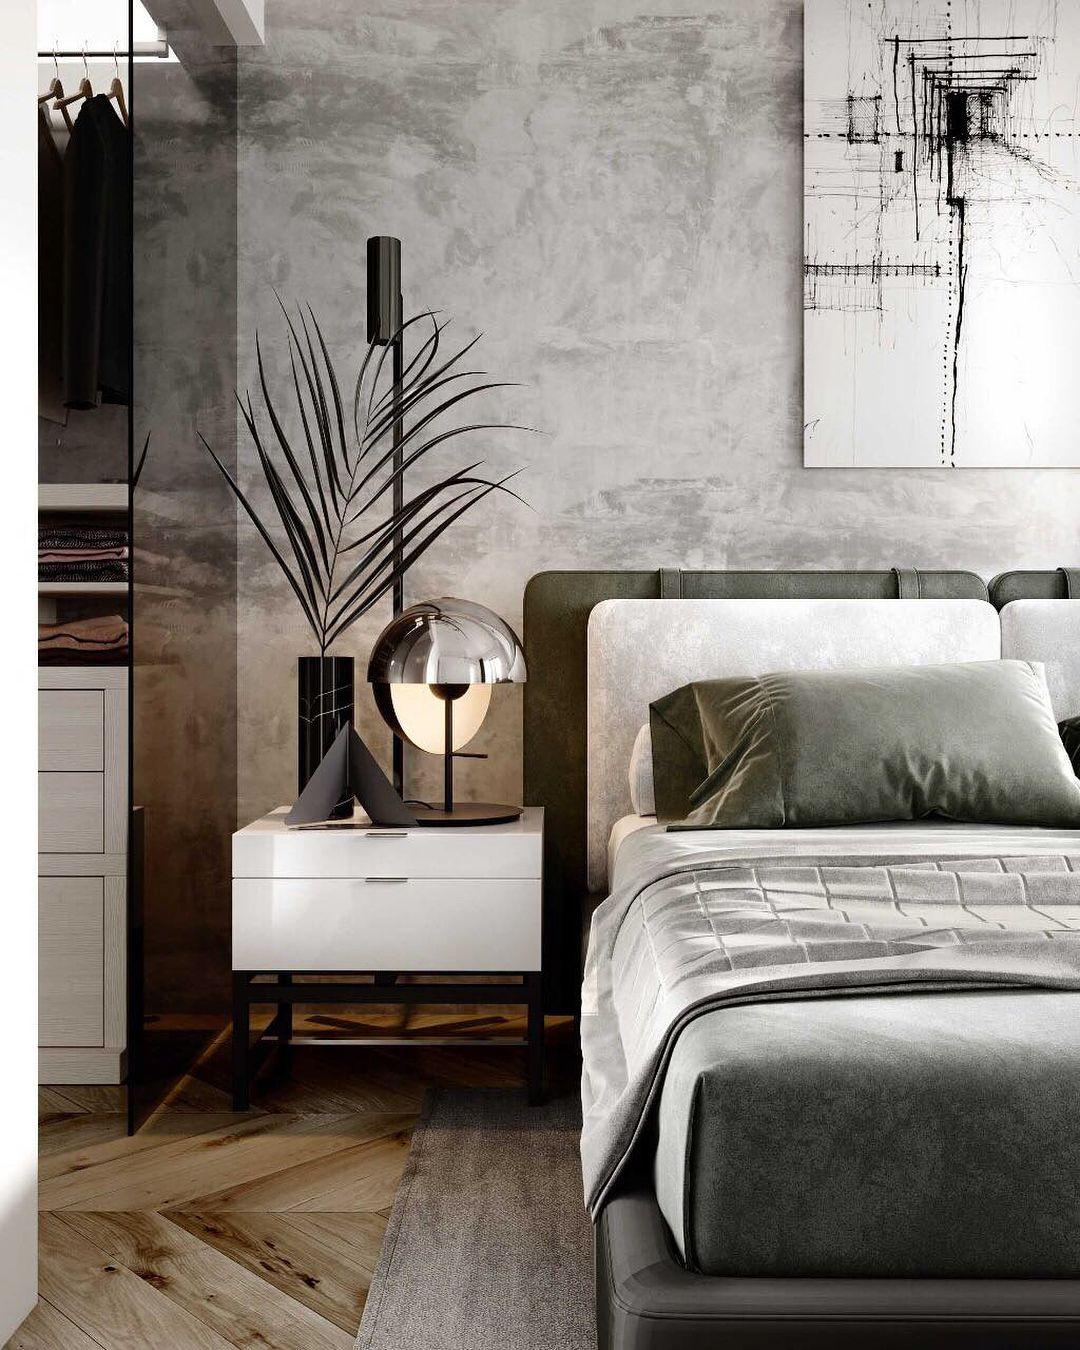 Luxury Master Bedroom Dubai On Behance: Small Apartments, Apartments In Dubai